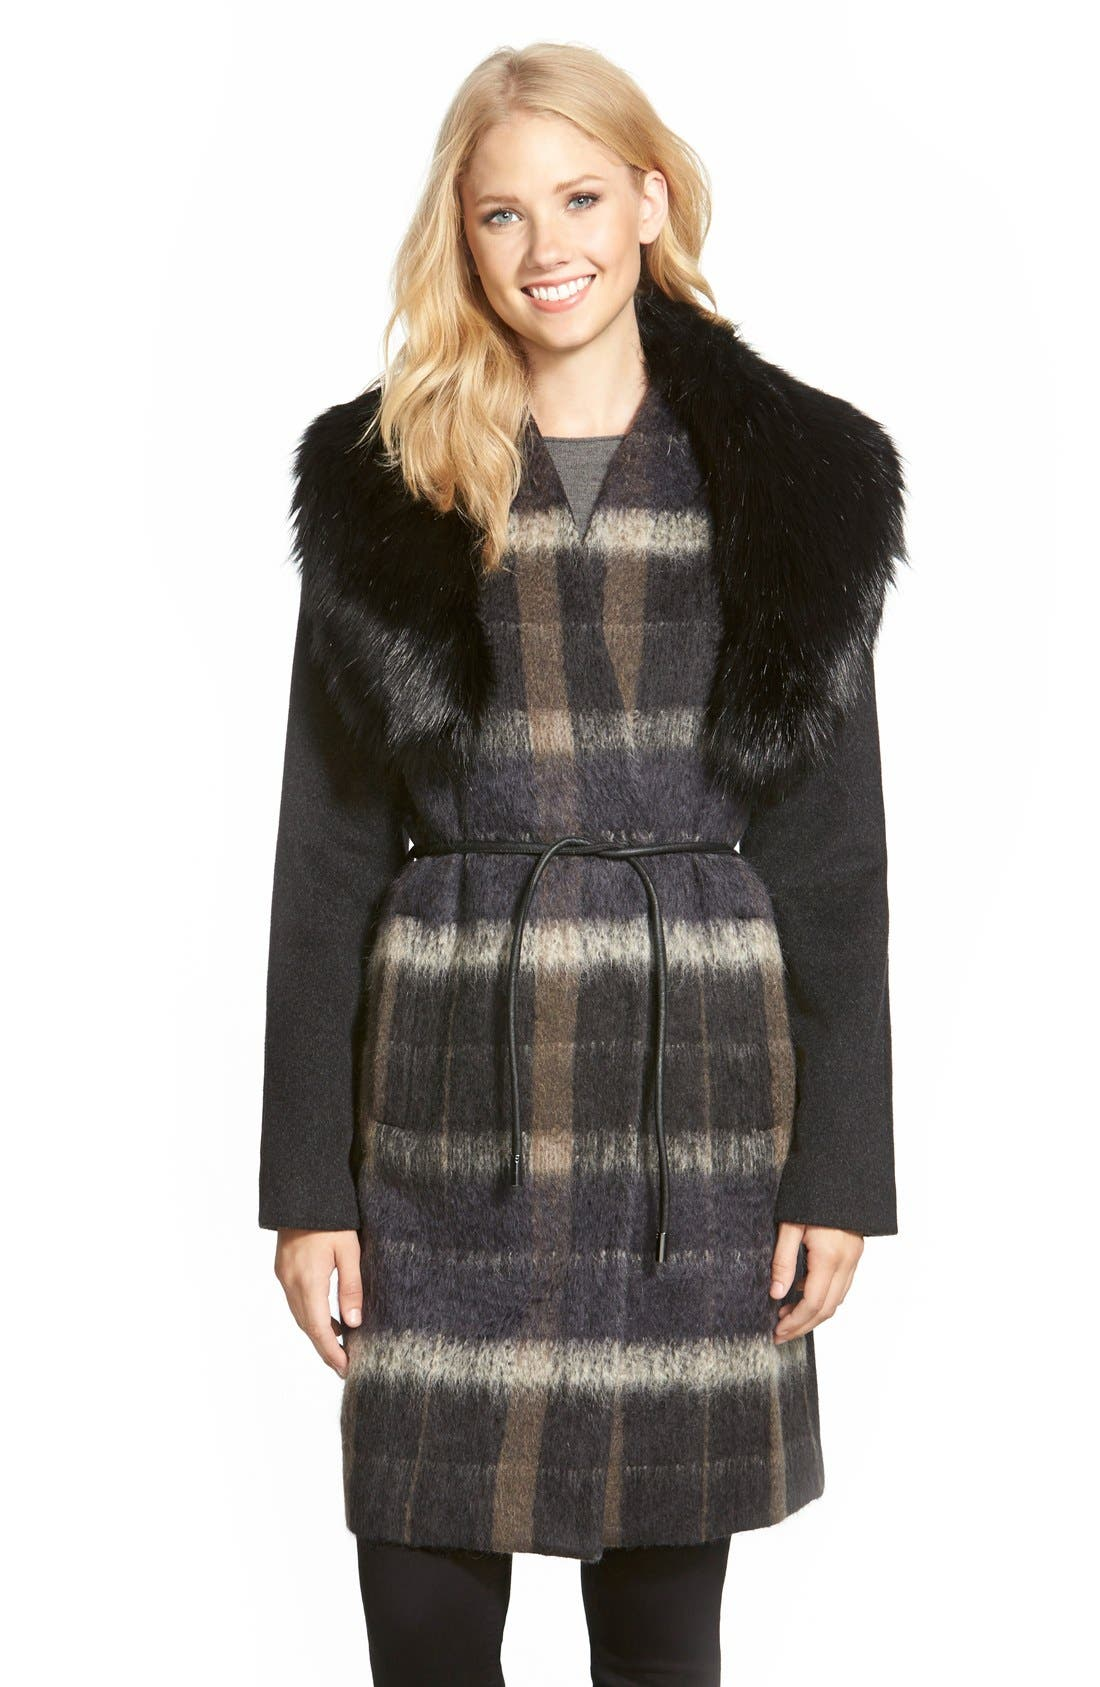 Alternate Image 1 Selected - Vera Wang 'Sophie' Faux Fur Collar Mixed Media Coat